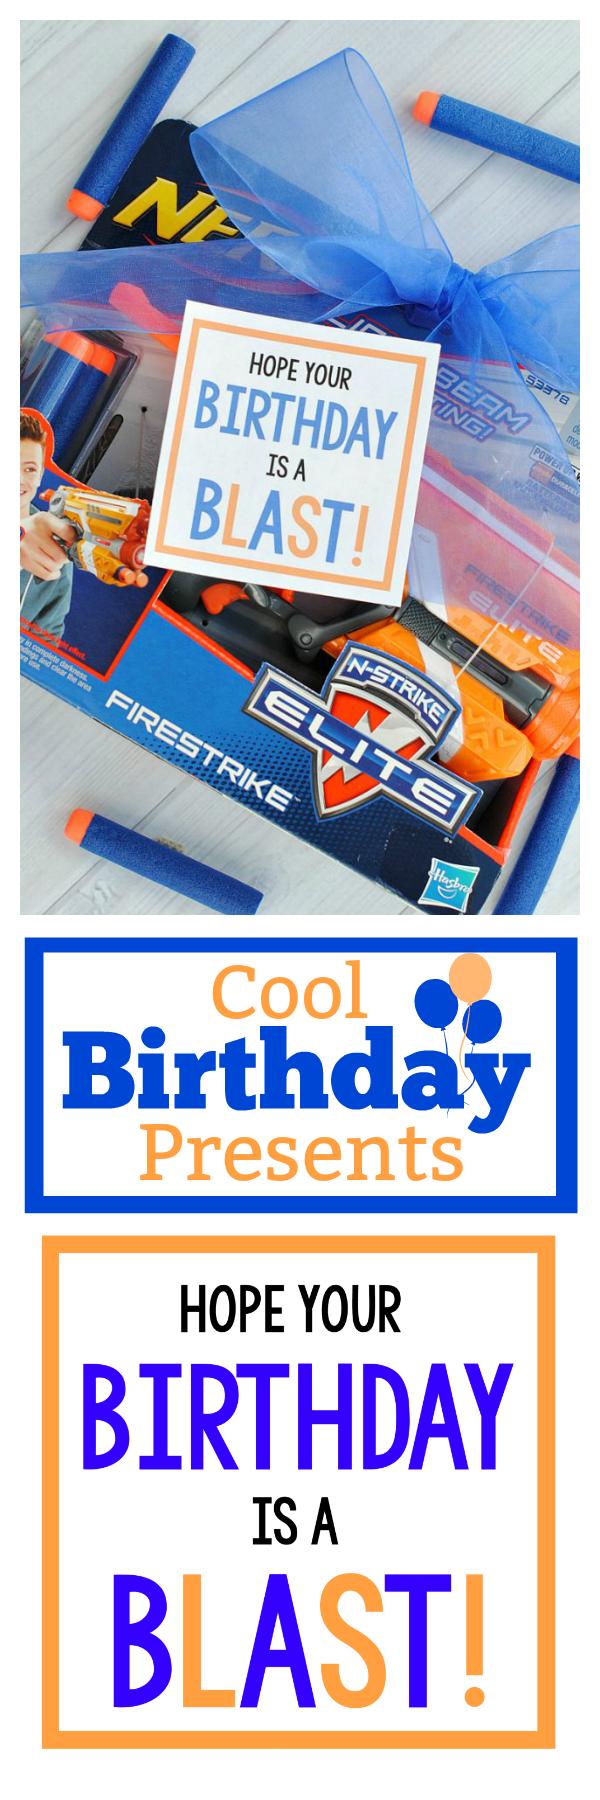 Cool Birthday Presents: Nerf Gun Gift Idea. Simple and fun birthday gift idea